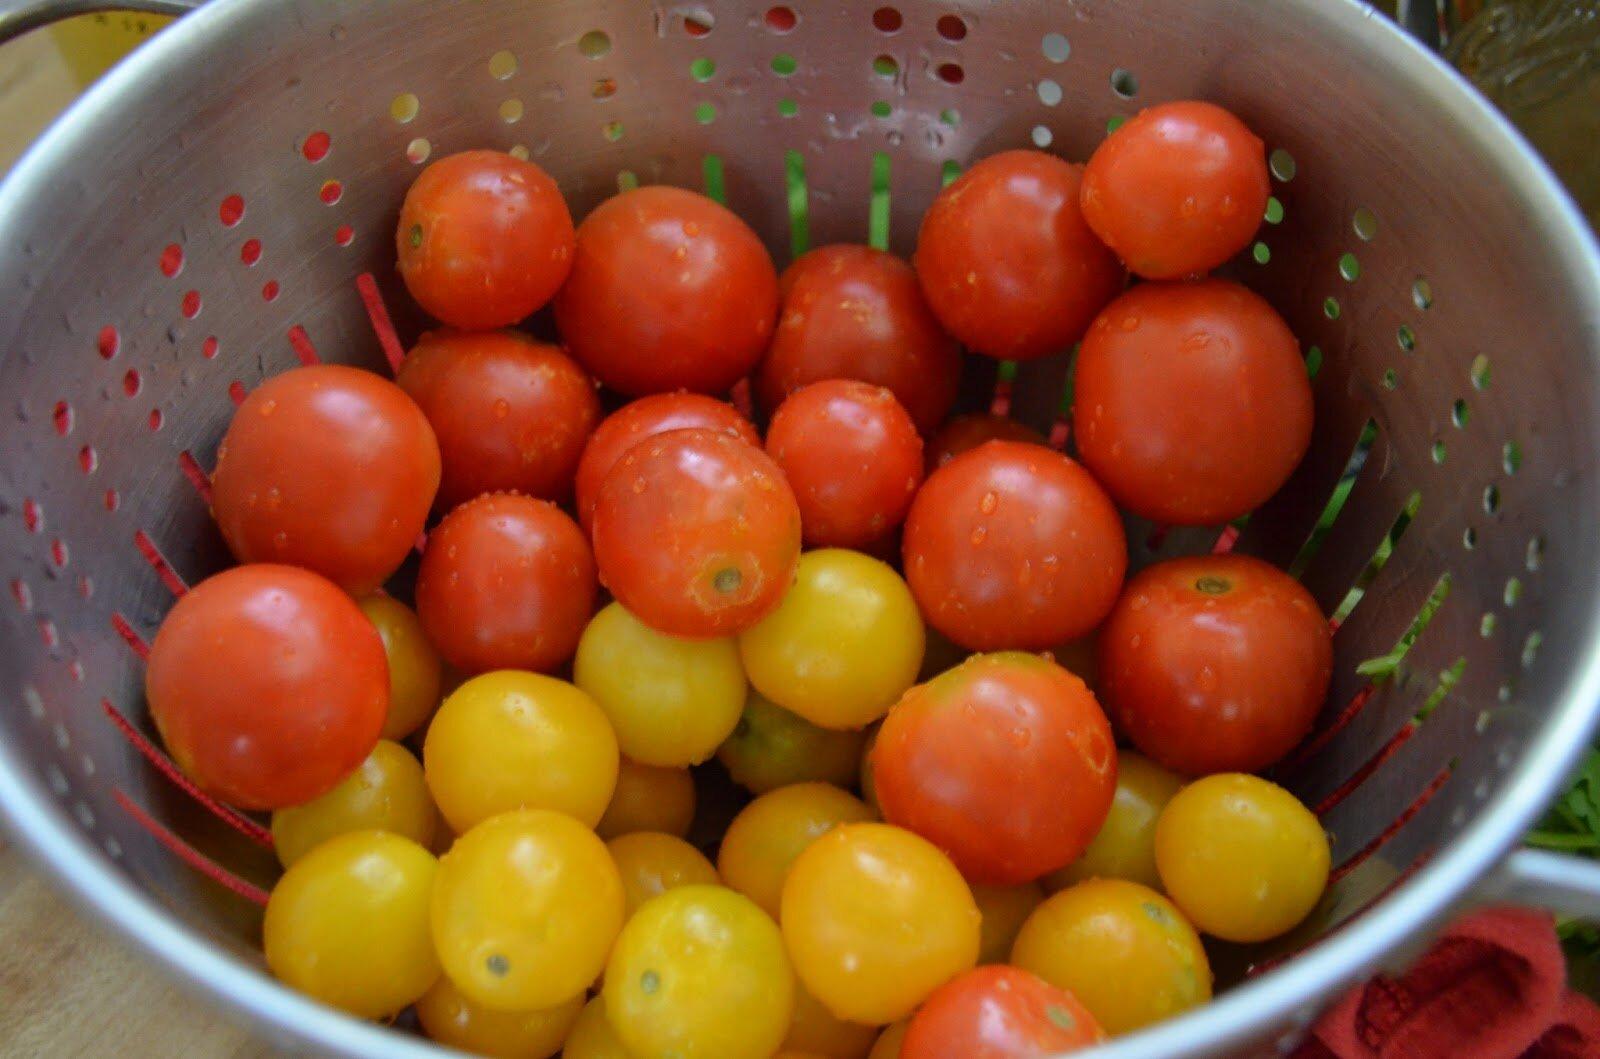 tomato corn salsa in mrs pineapple tomato onion pineapple tomato salsa ...